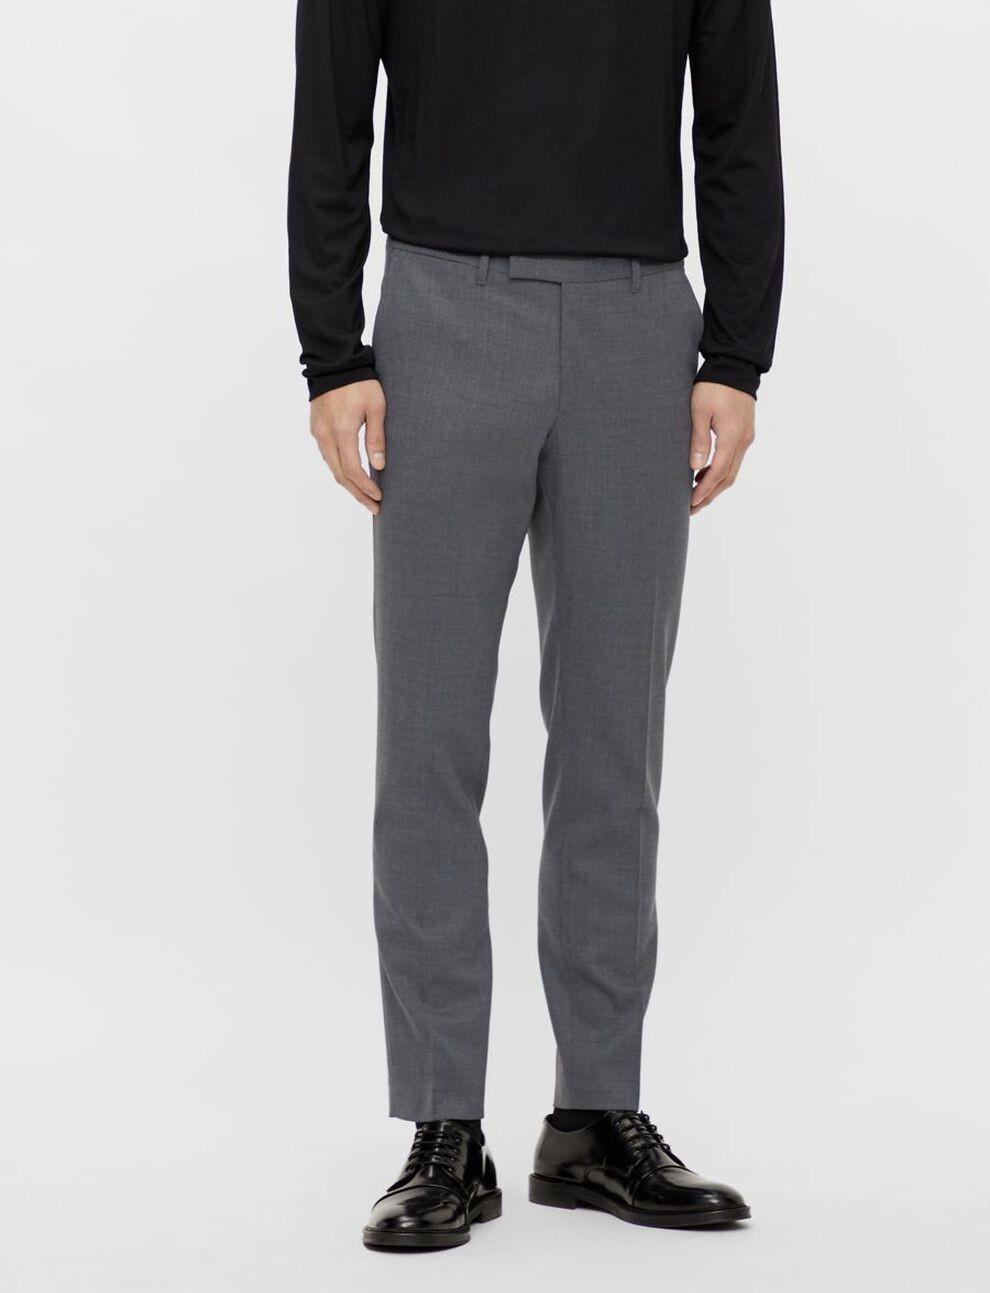 J. LINDEBERG Grant Micro Str grå dressbukse til herre